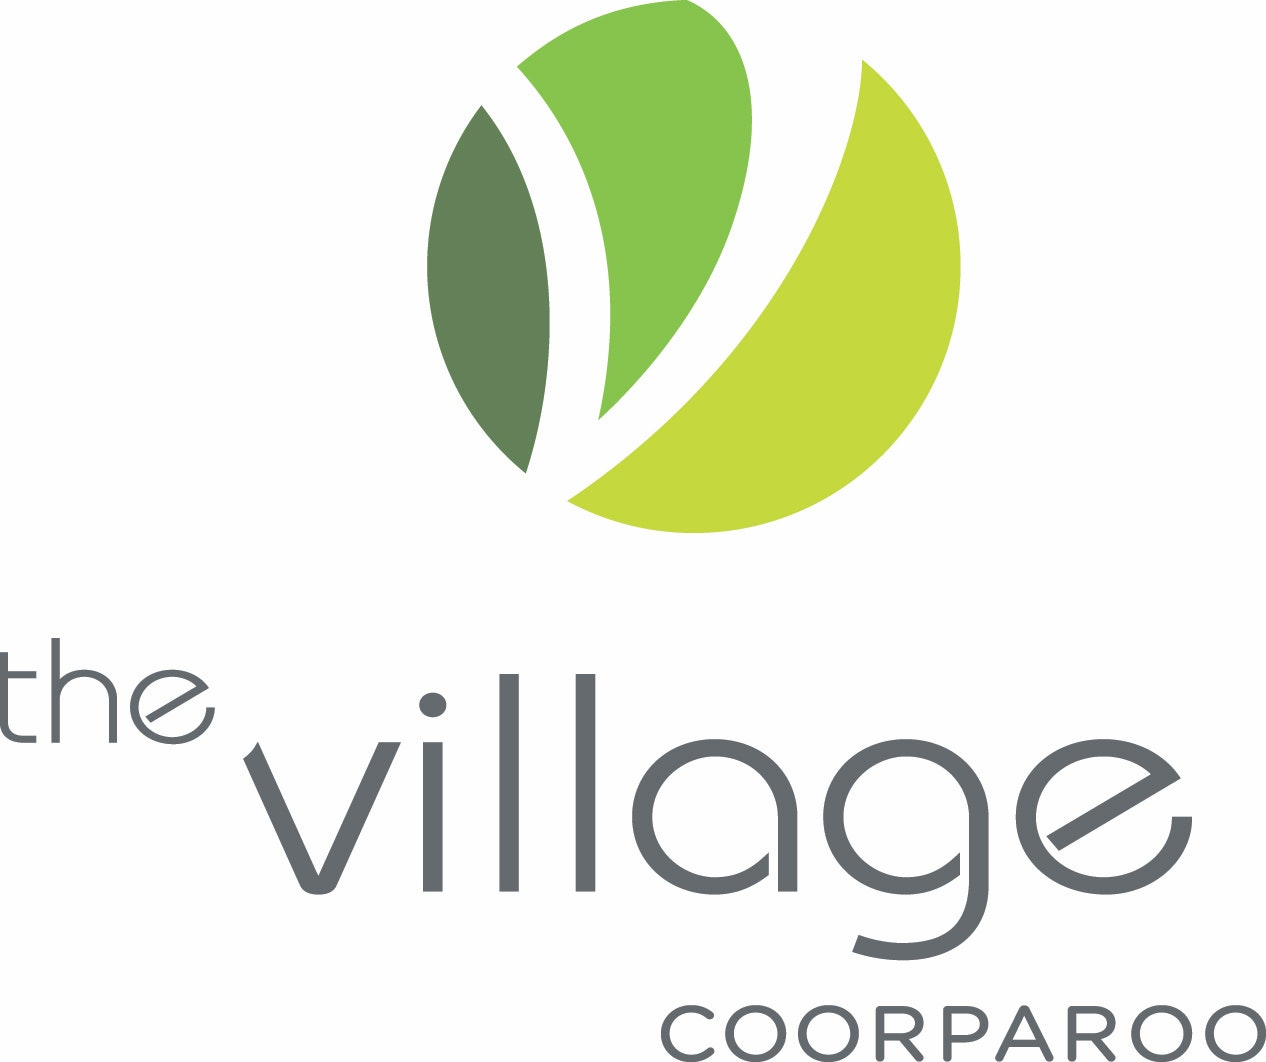 The Village Coorparoo logo